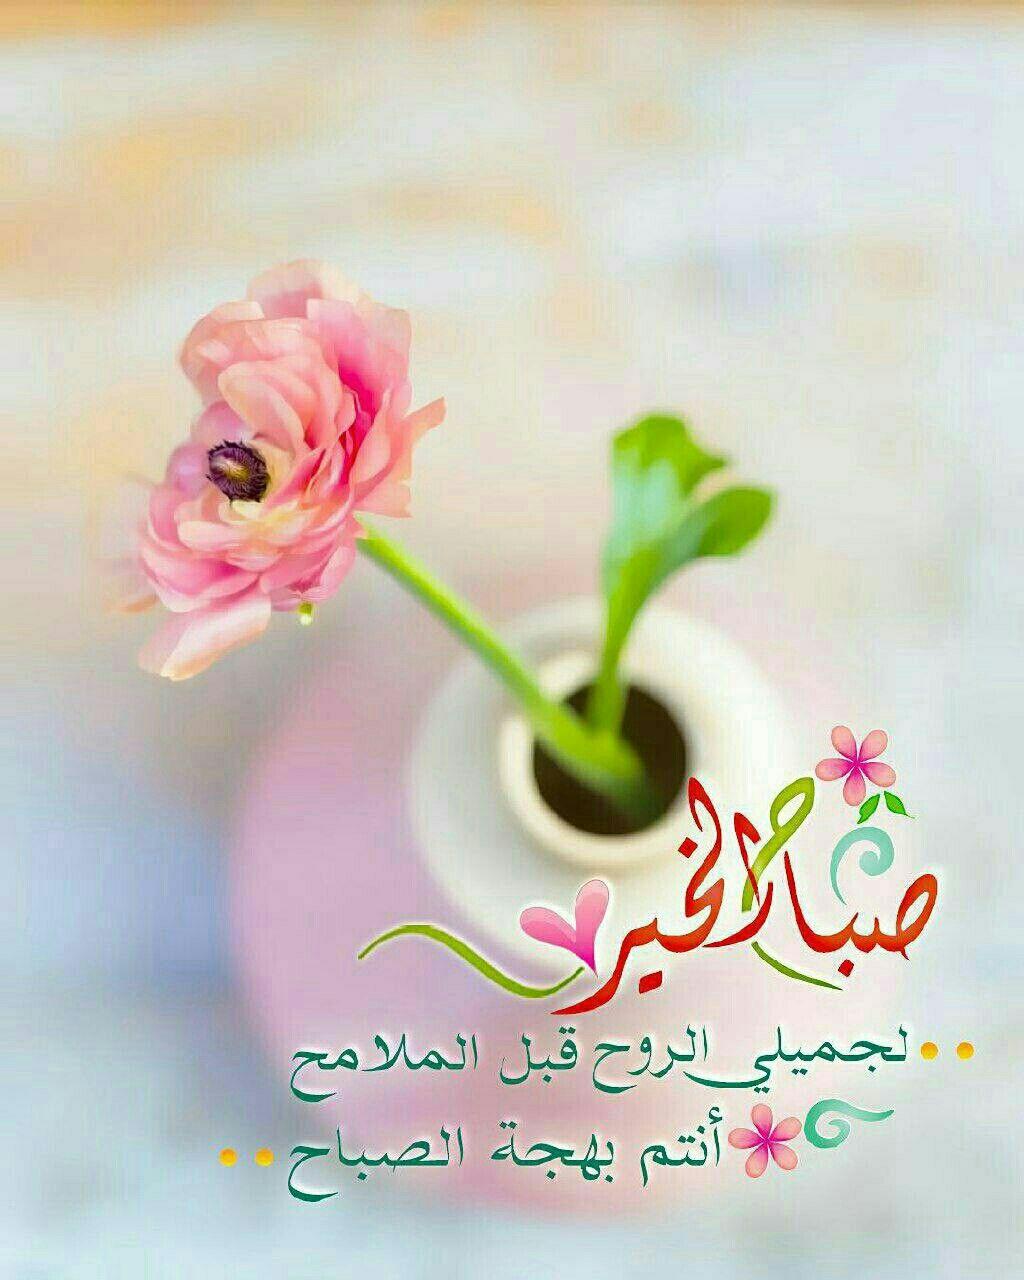 Pin By M M On صباح ومساء الخير أحبتي Good Morning Arabic Morning Greeting Morning Images